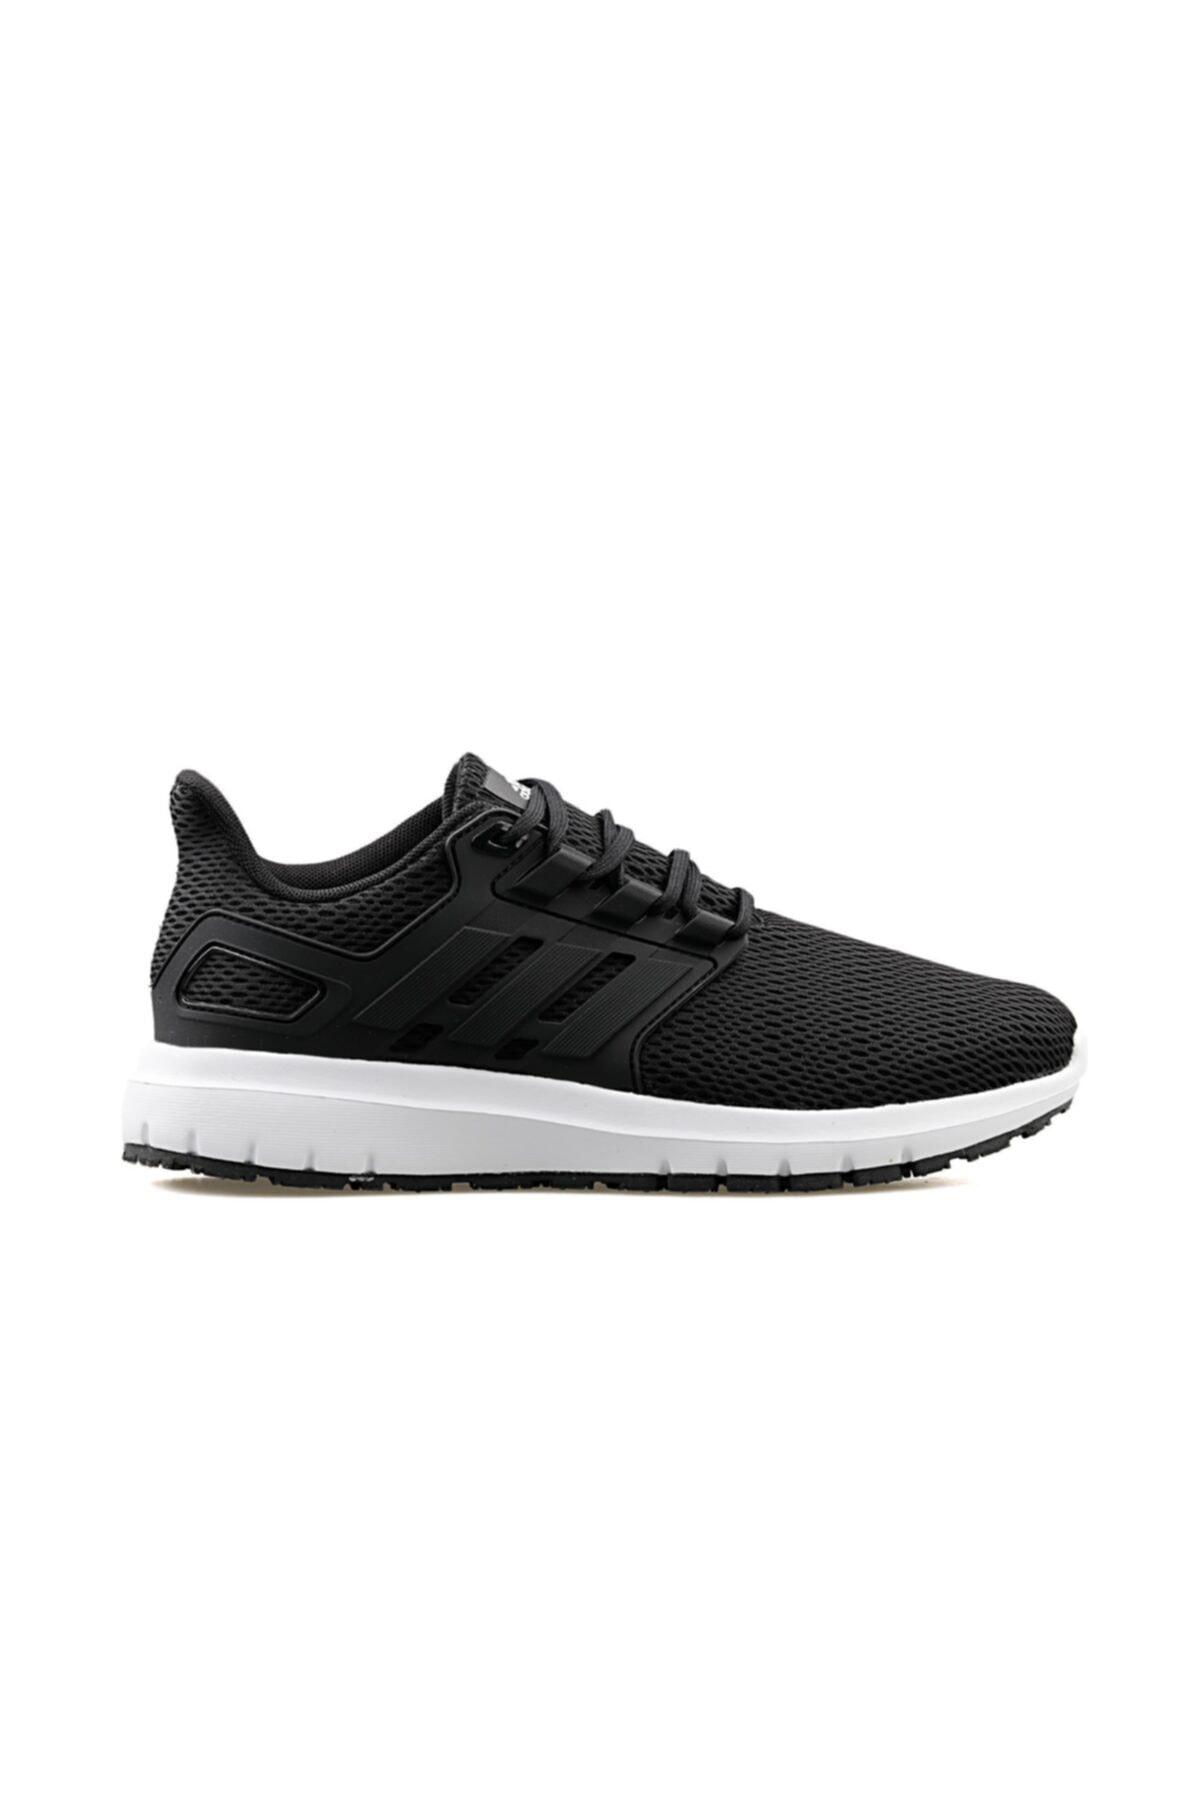 adidas ULTIMASHOW Siyah Erkek Koşu Ayakkabısı 100663829 2